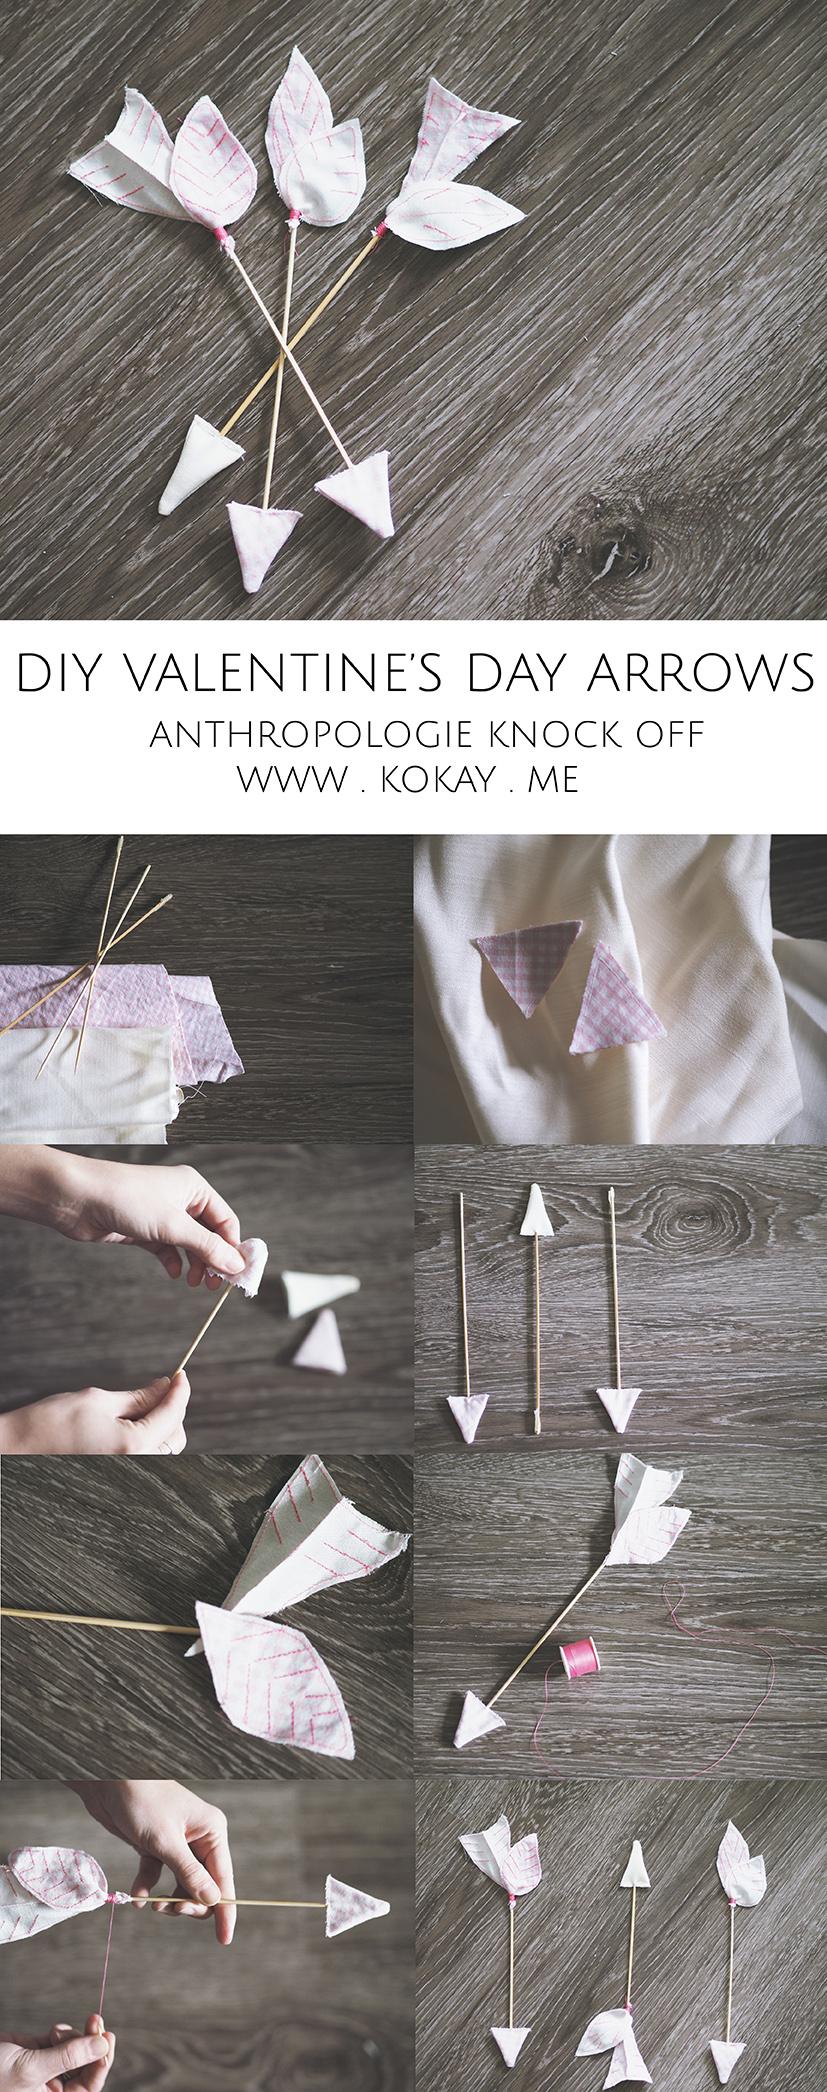 Anthropologie knock off Valentine's day arrows (diy tutorial)